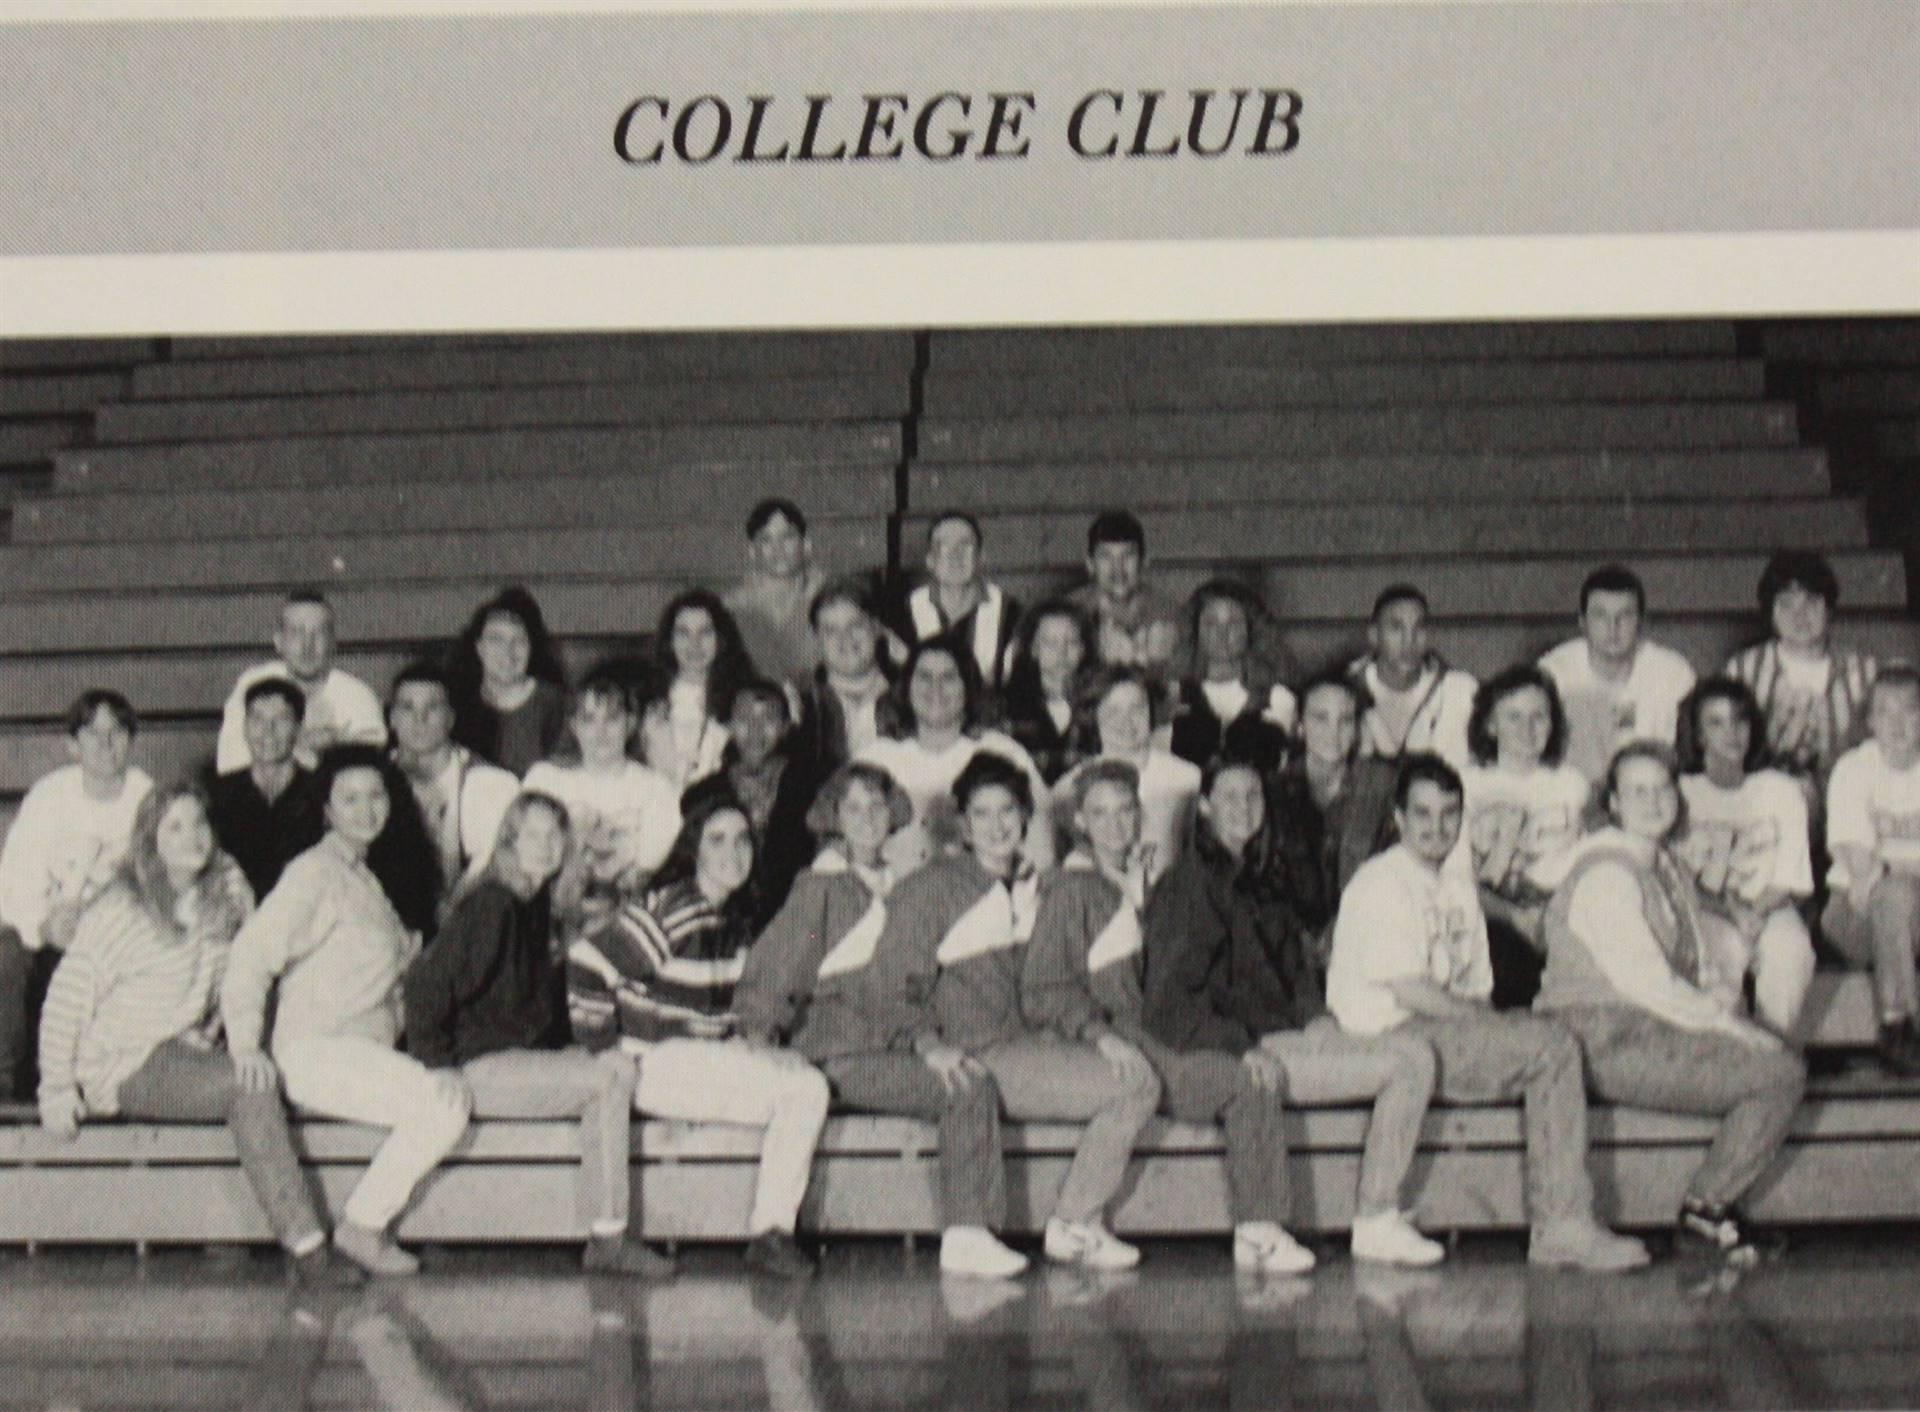 1995 College Club